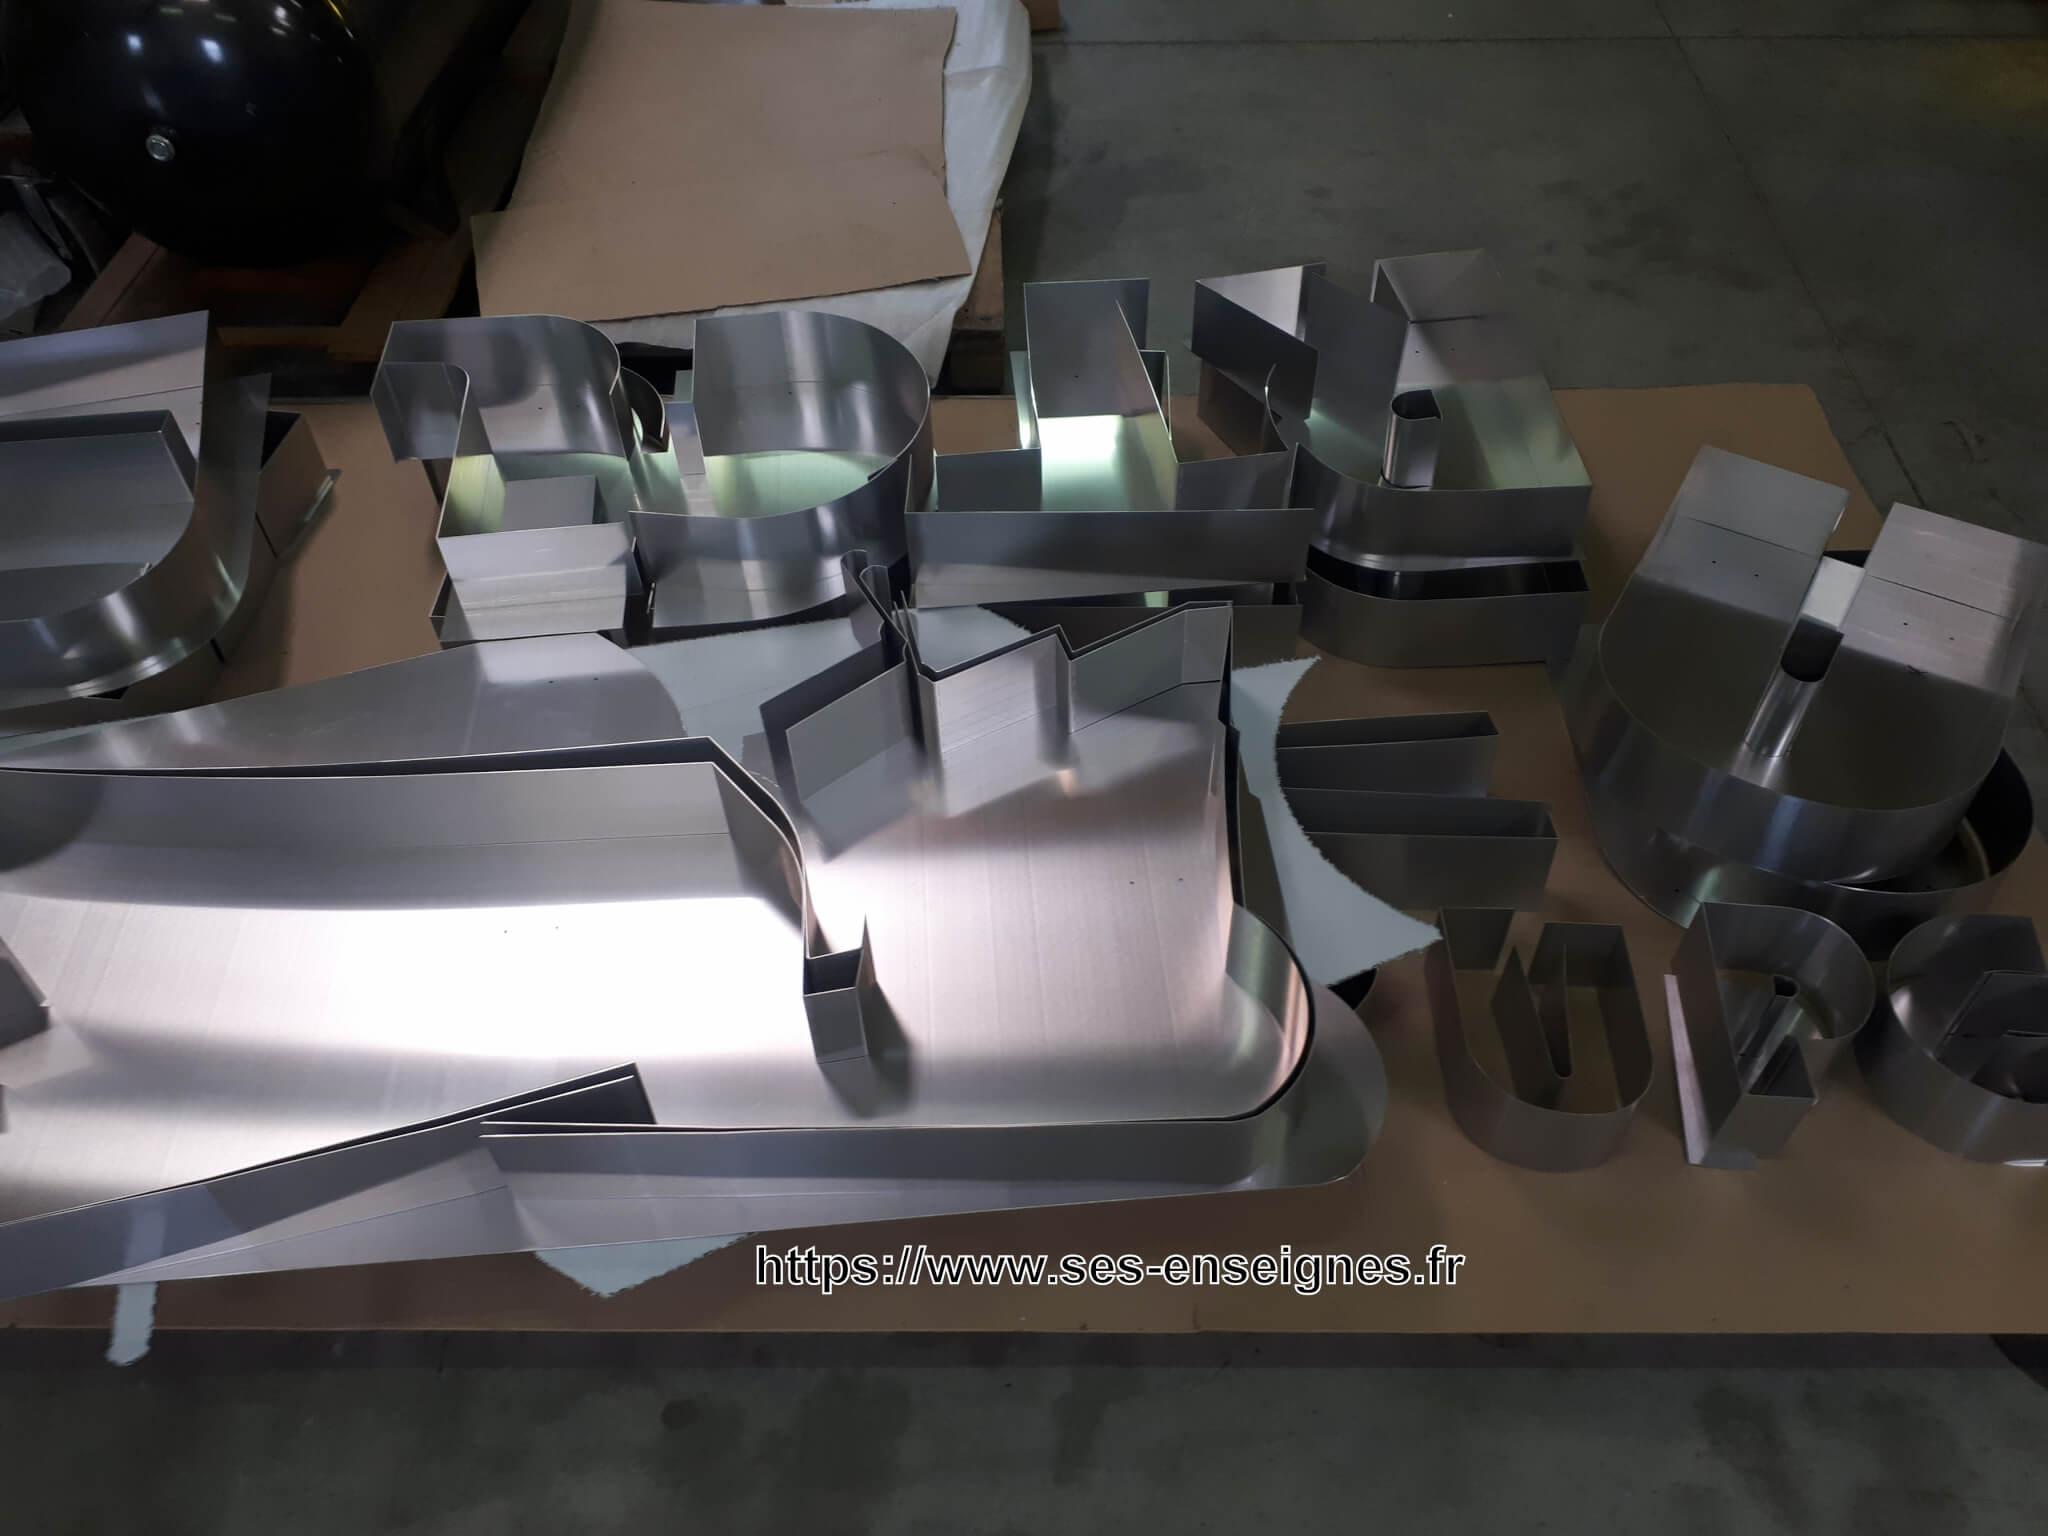 Enseignes lumineuses Rhône - Fabrication lettres enseignes led - SES Grigny - Lyon